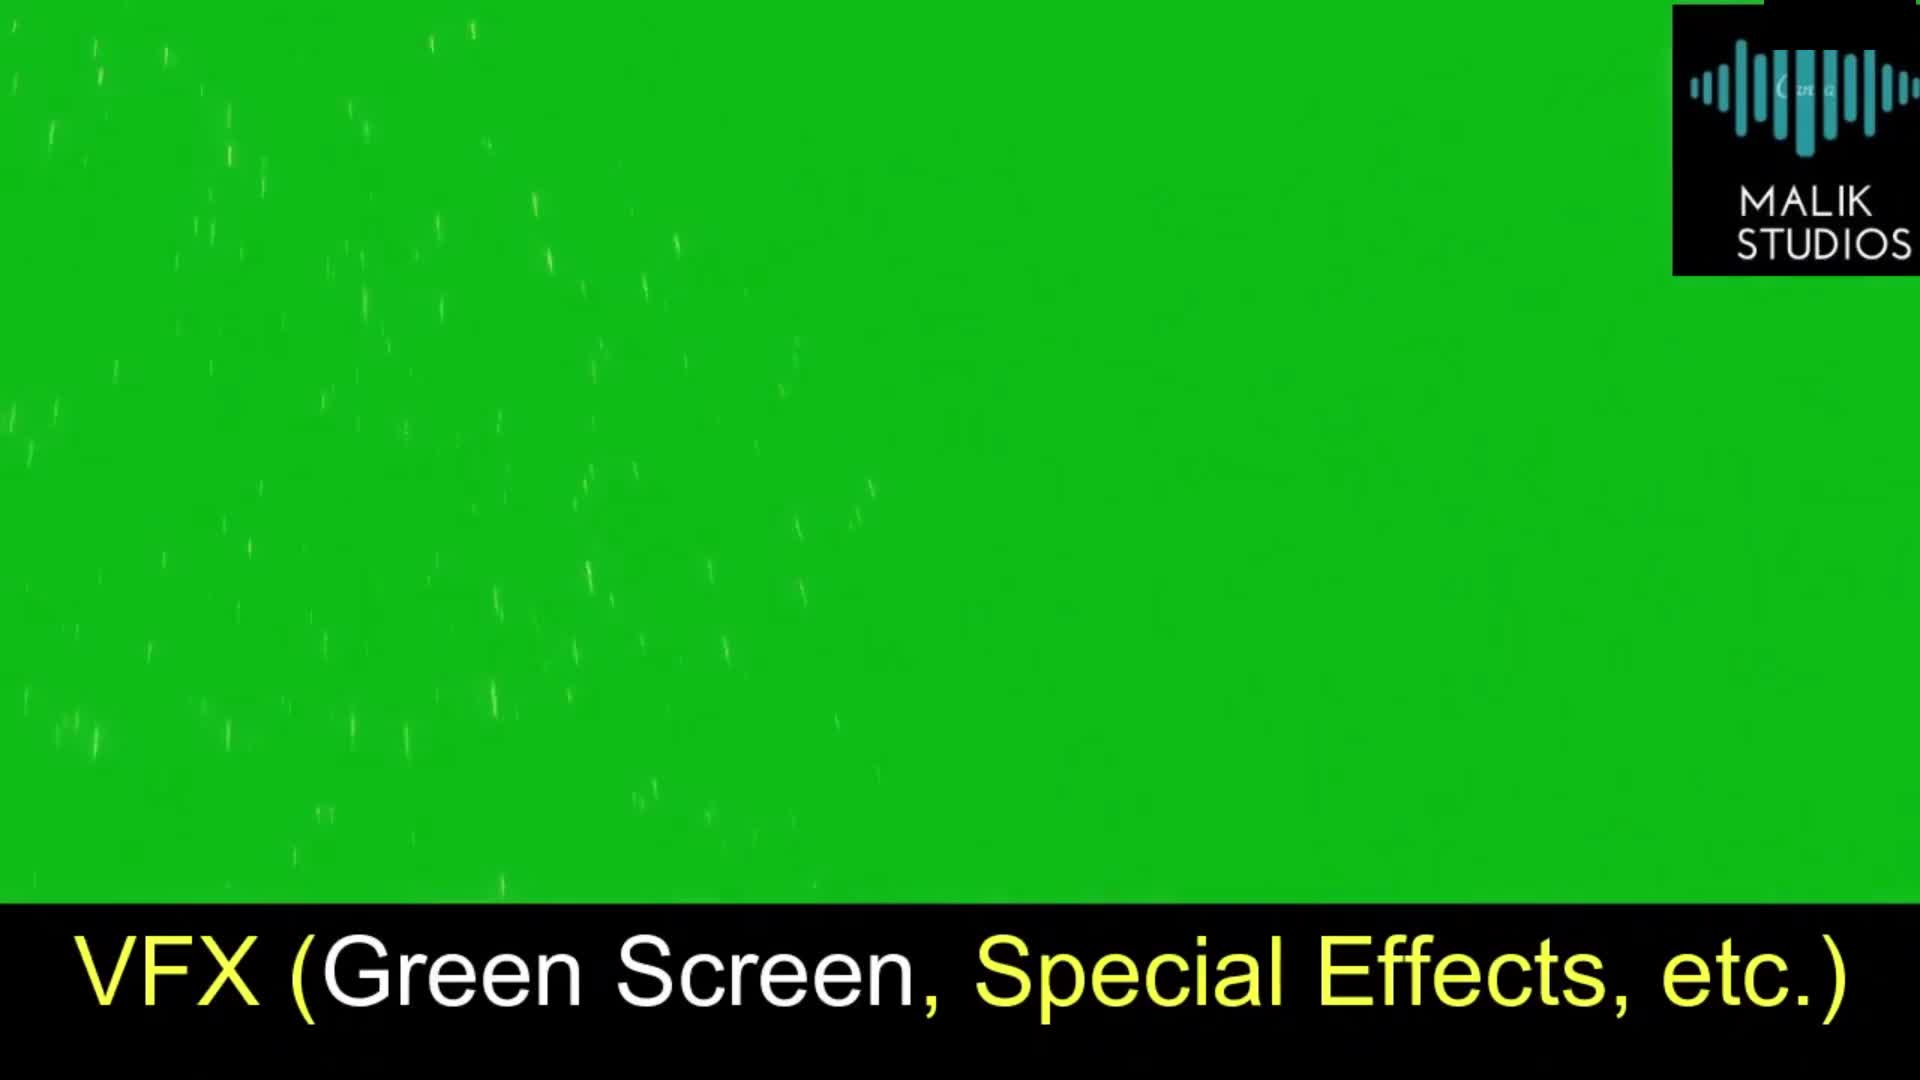 professional-video-animation-freelancer-image-52764